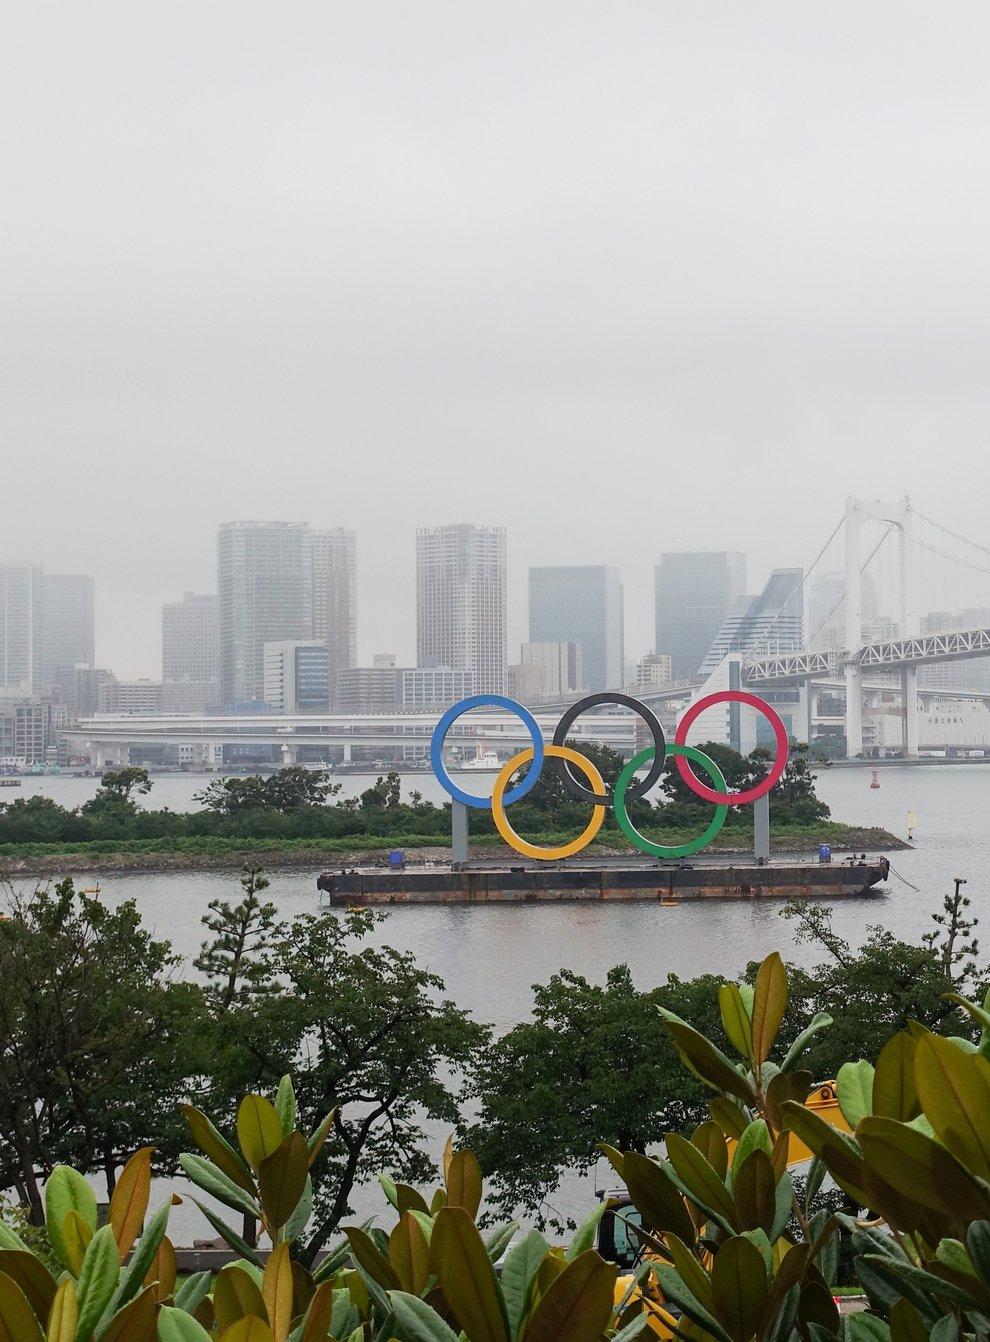 IOC officials remain optimistic ahead of the re-arranged Tokyo Games